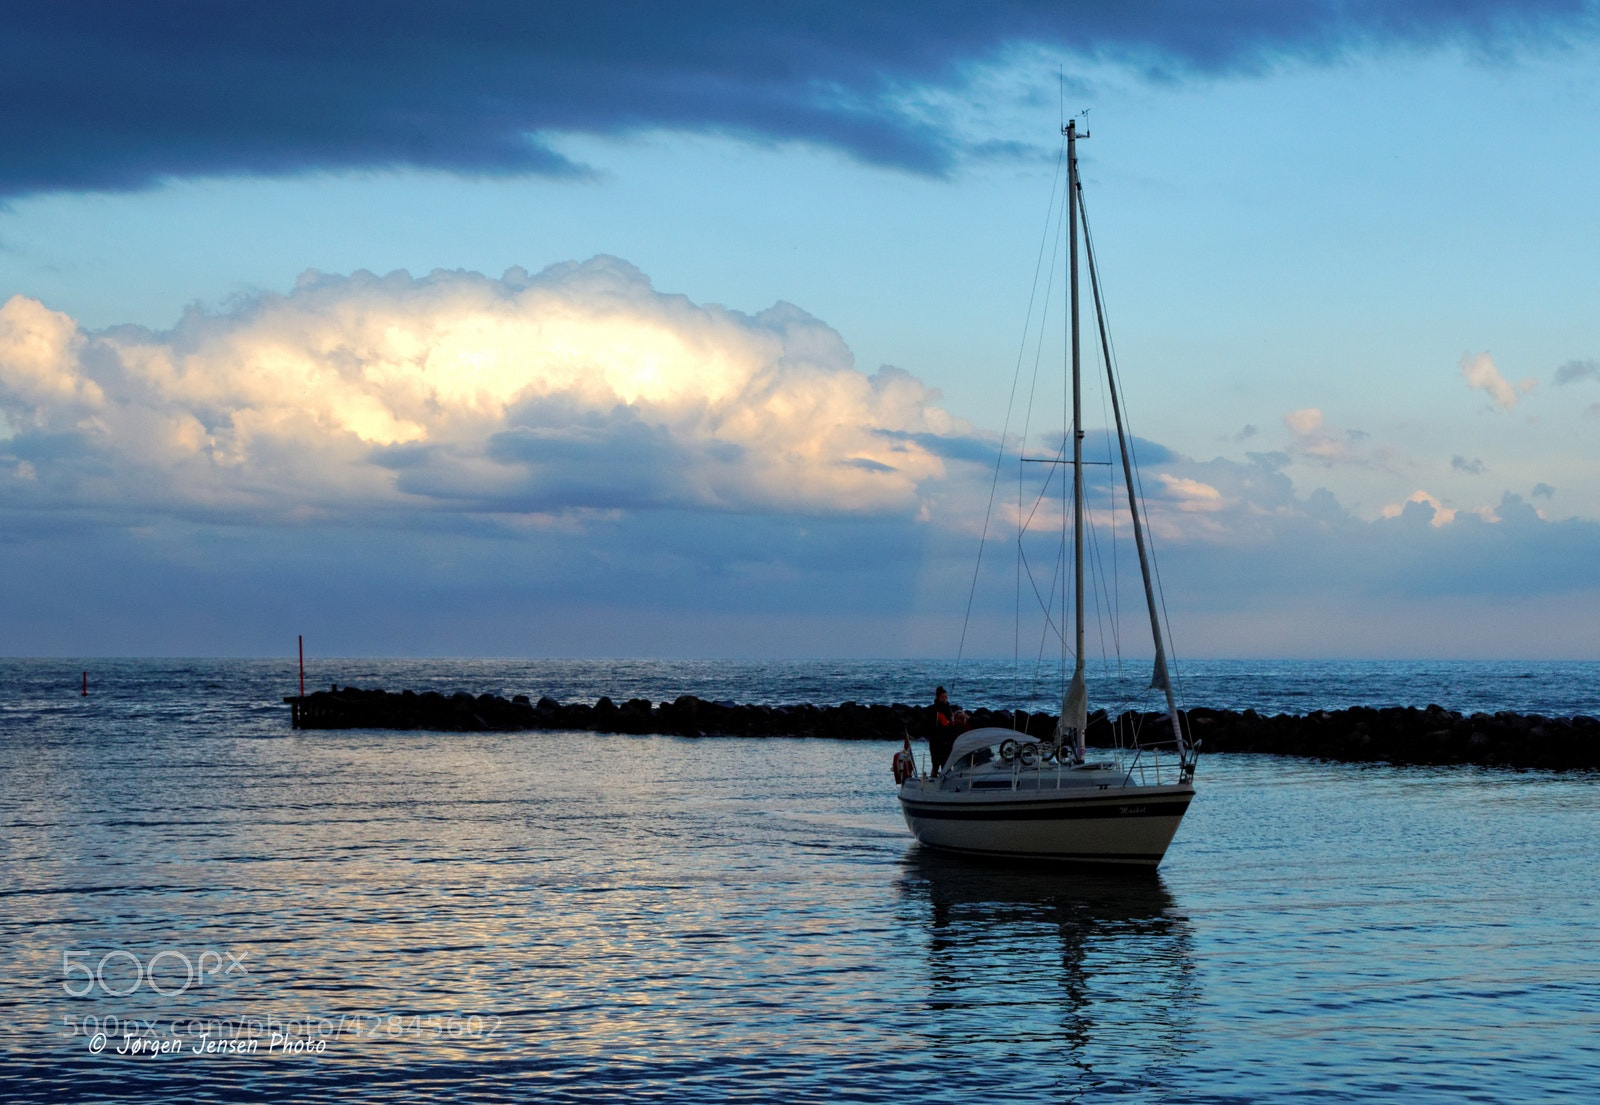 Photograph Evening boat trip by Jørgen Jensen on 500px